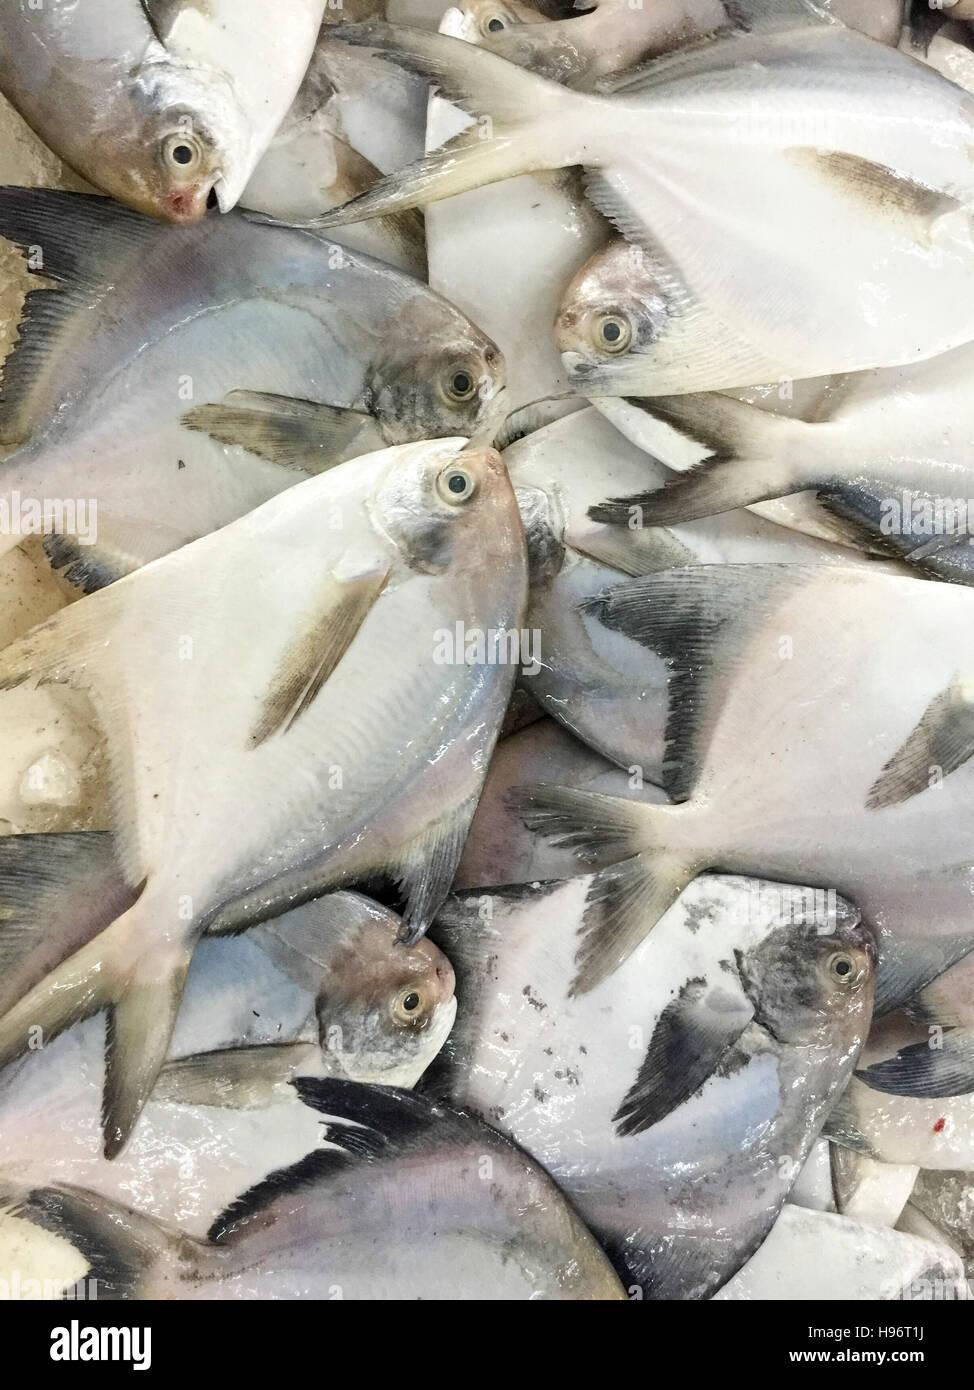 Close up of fresh fish  pomfret or local called Bawal Fish on display at fish market. - Stock Image